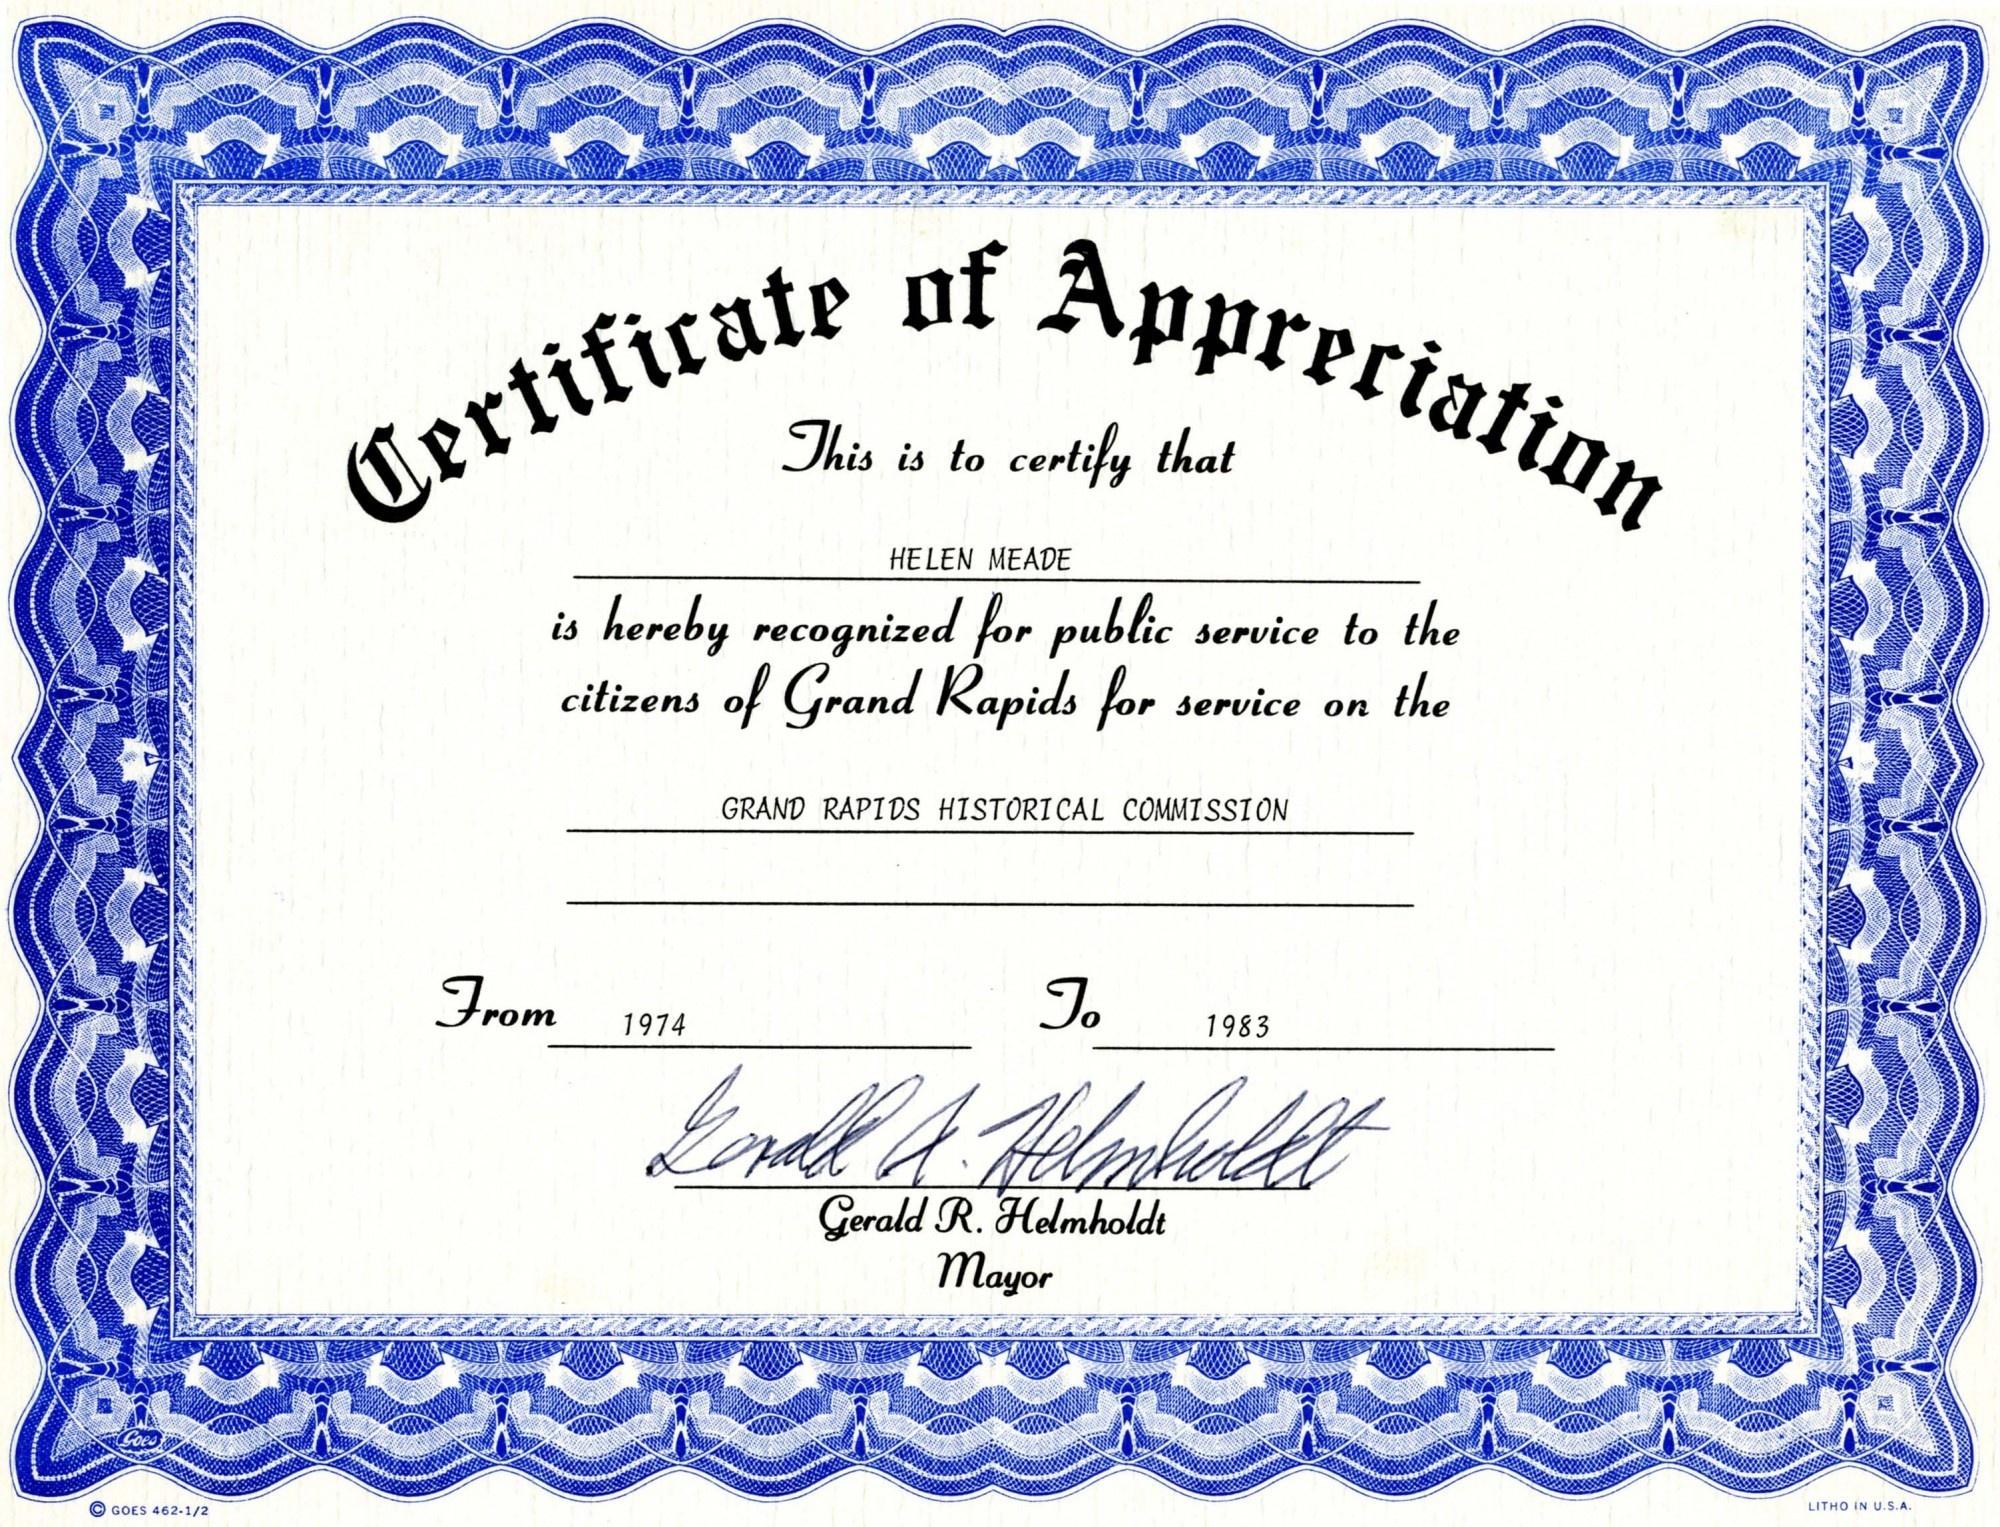 Appreciation Certificate Templates Free - Demir.iso-Consulting.co - Sports Certificate Templates Free Printable